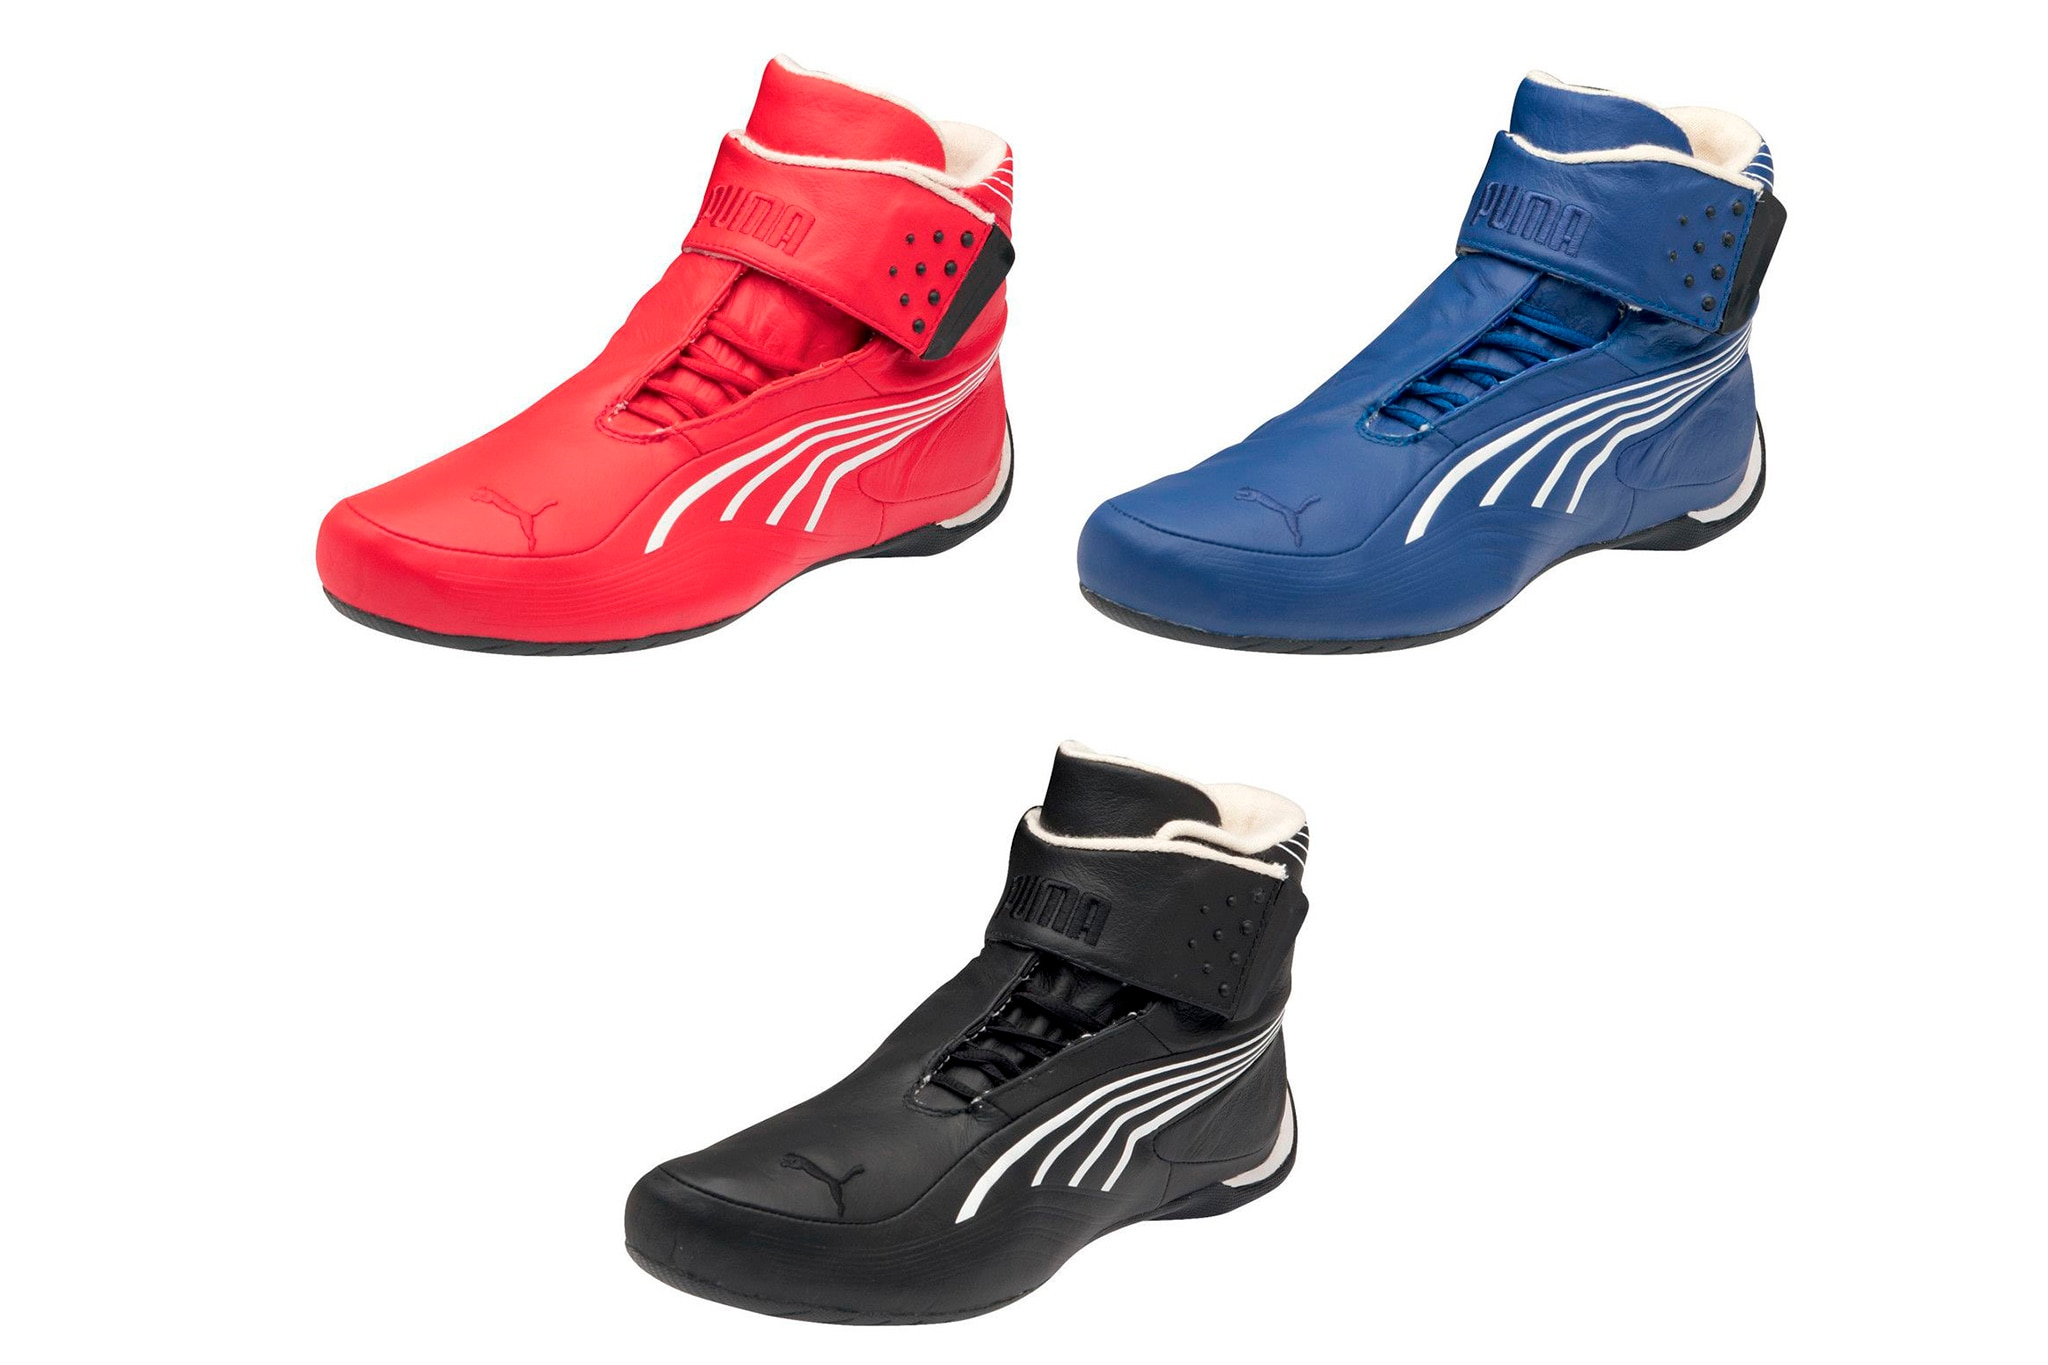 Driving Shoe Buyer's Guide - Fleet Feet